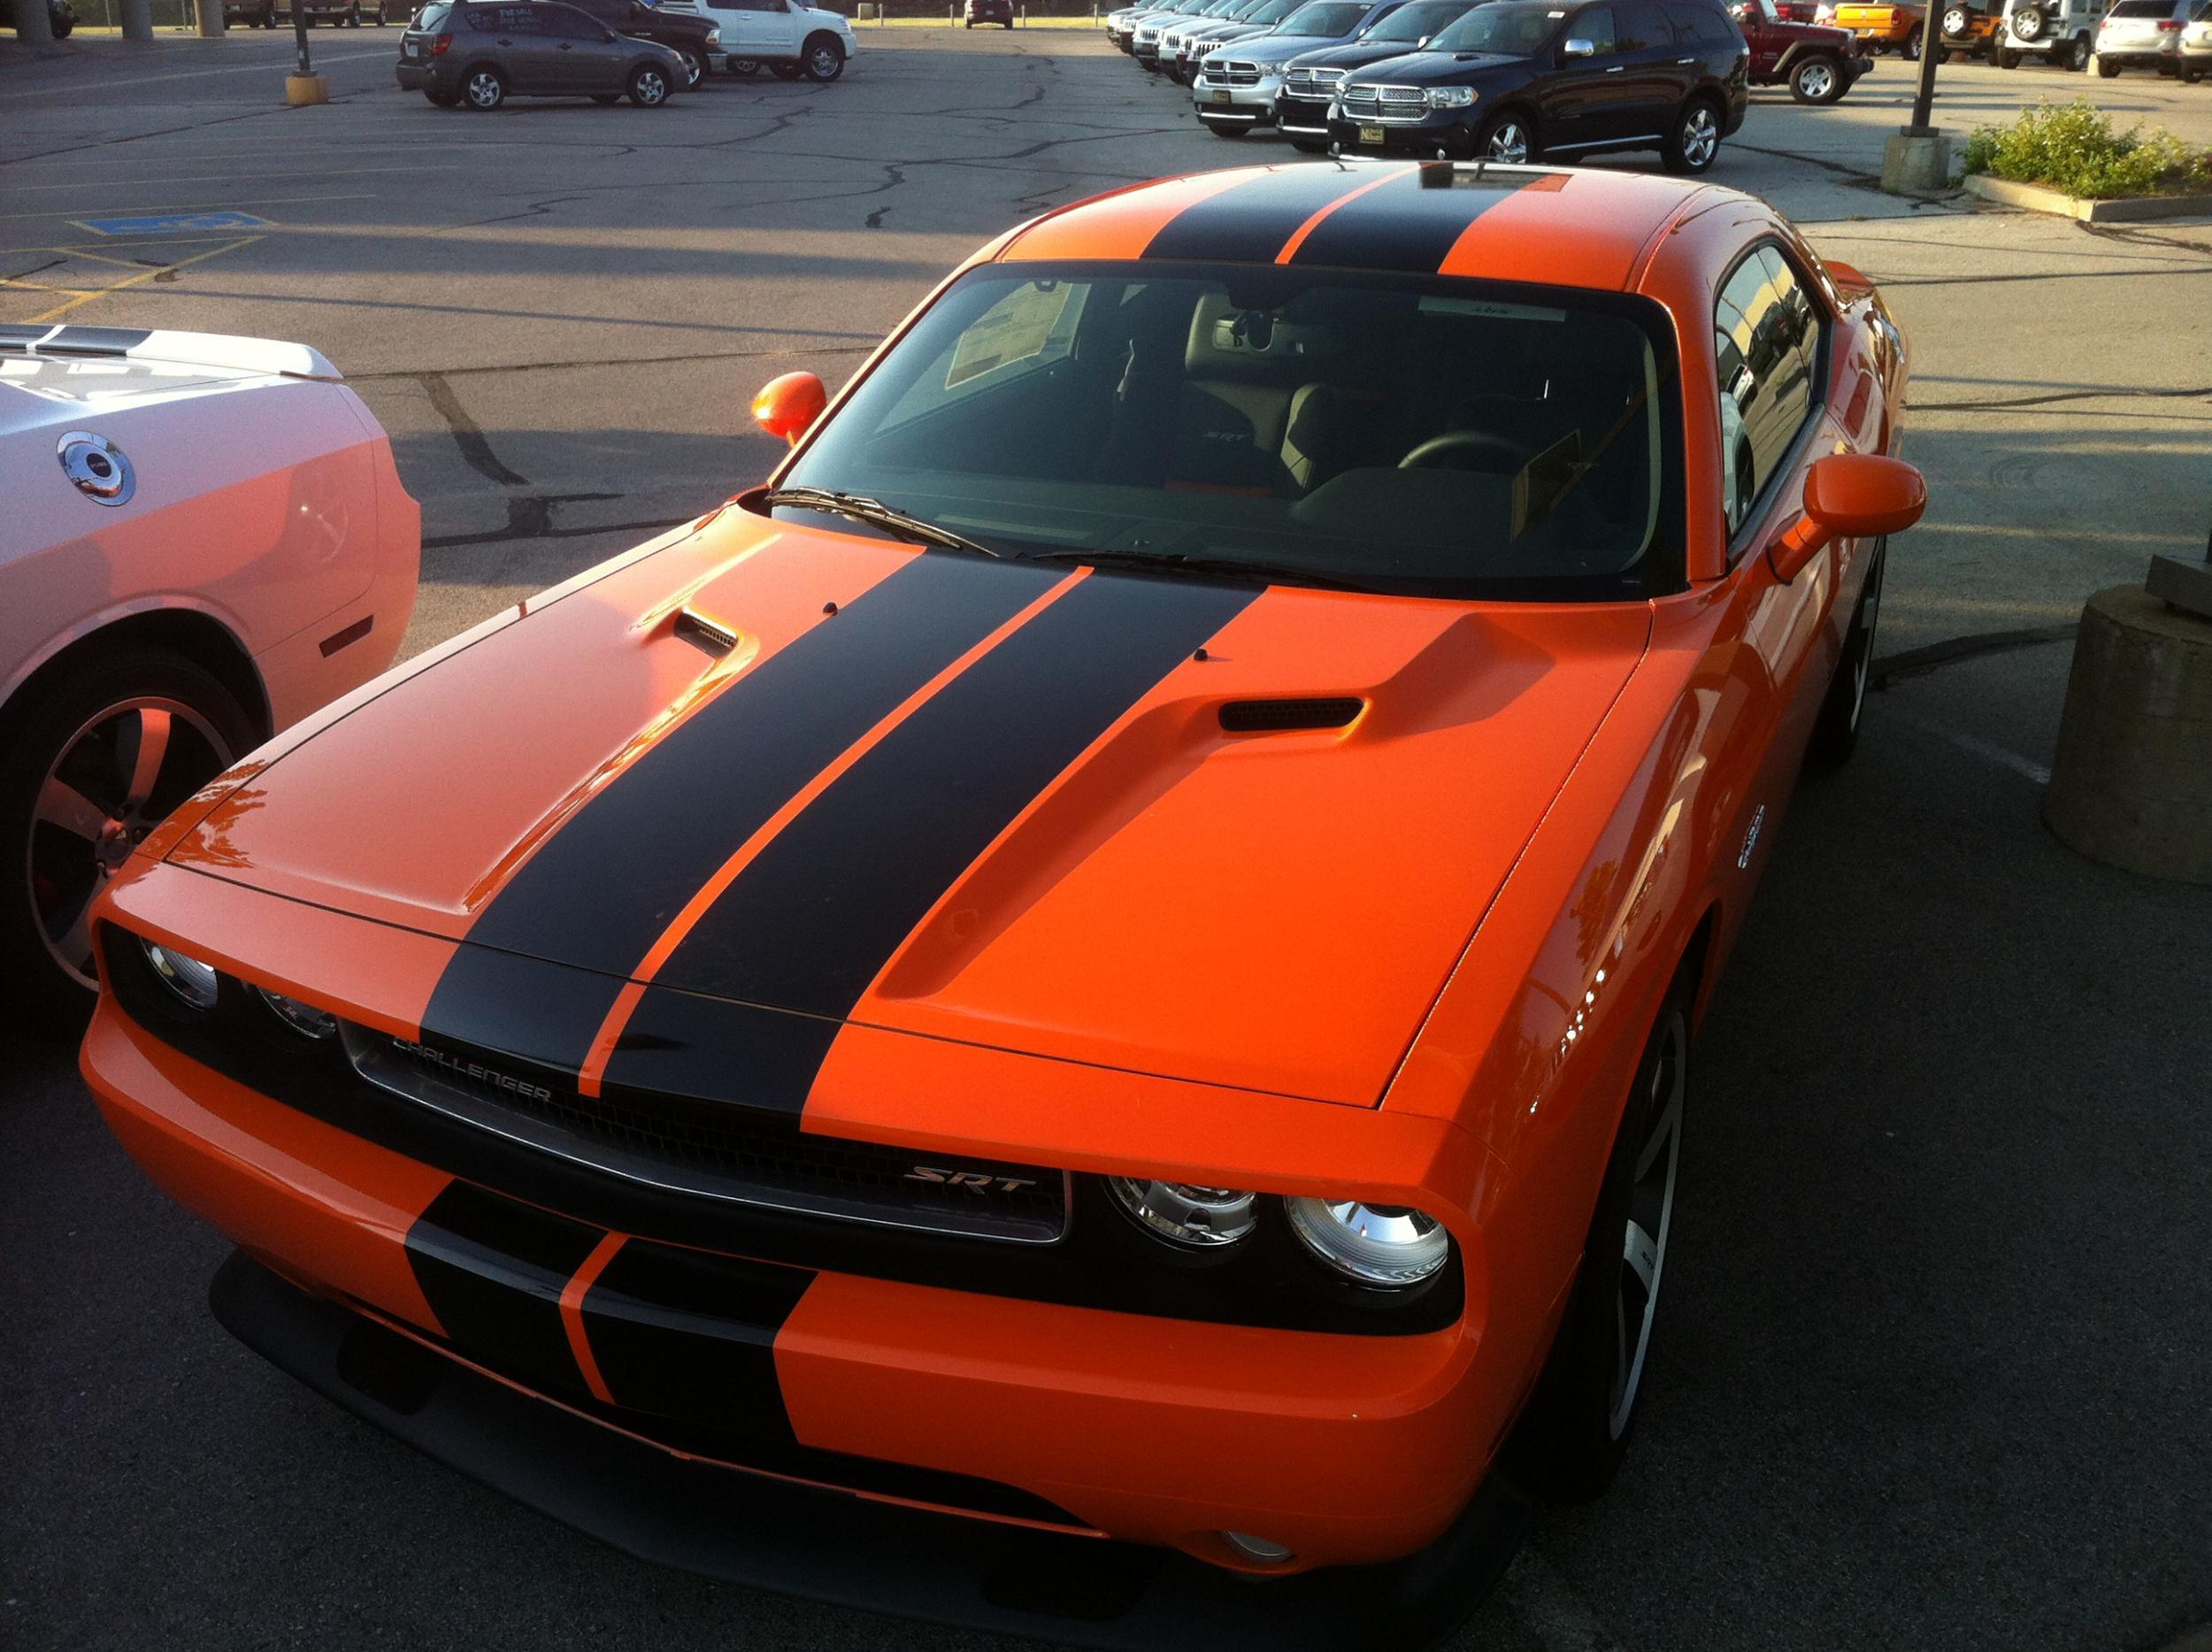 Hemi and Header Orange Challengers-008.jpg